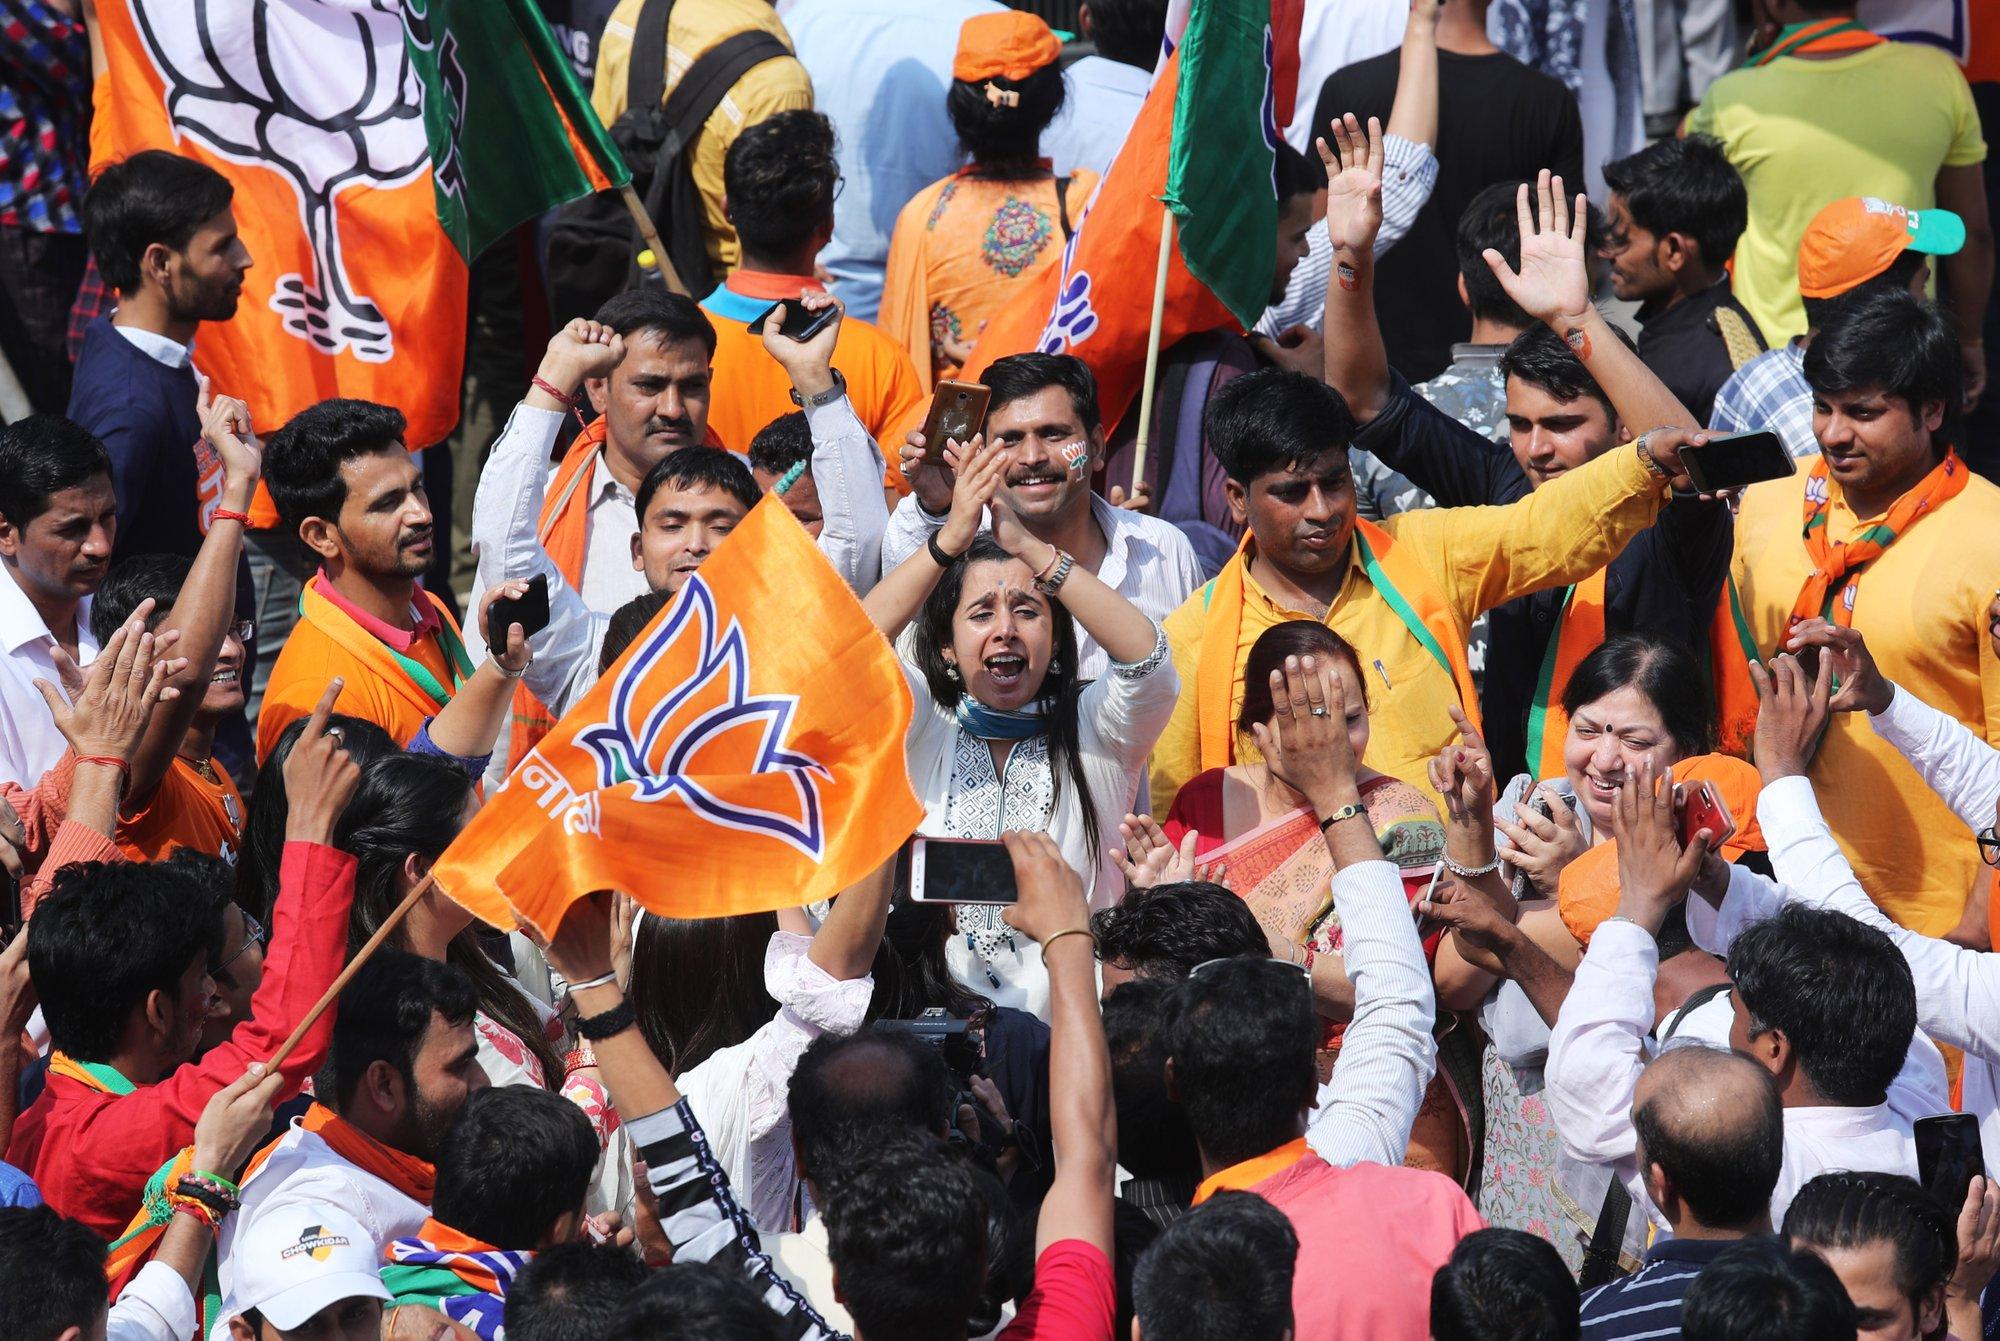 Pakistan PM congratulates Modi on India election